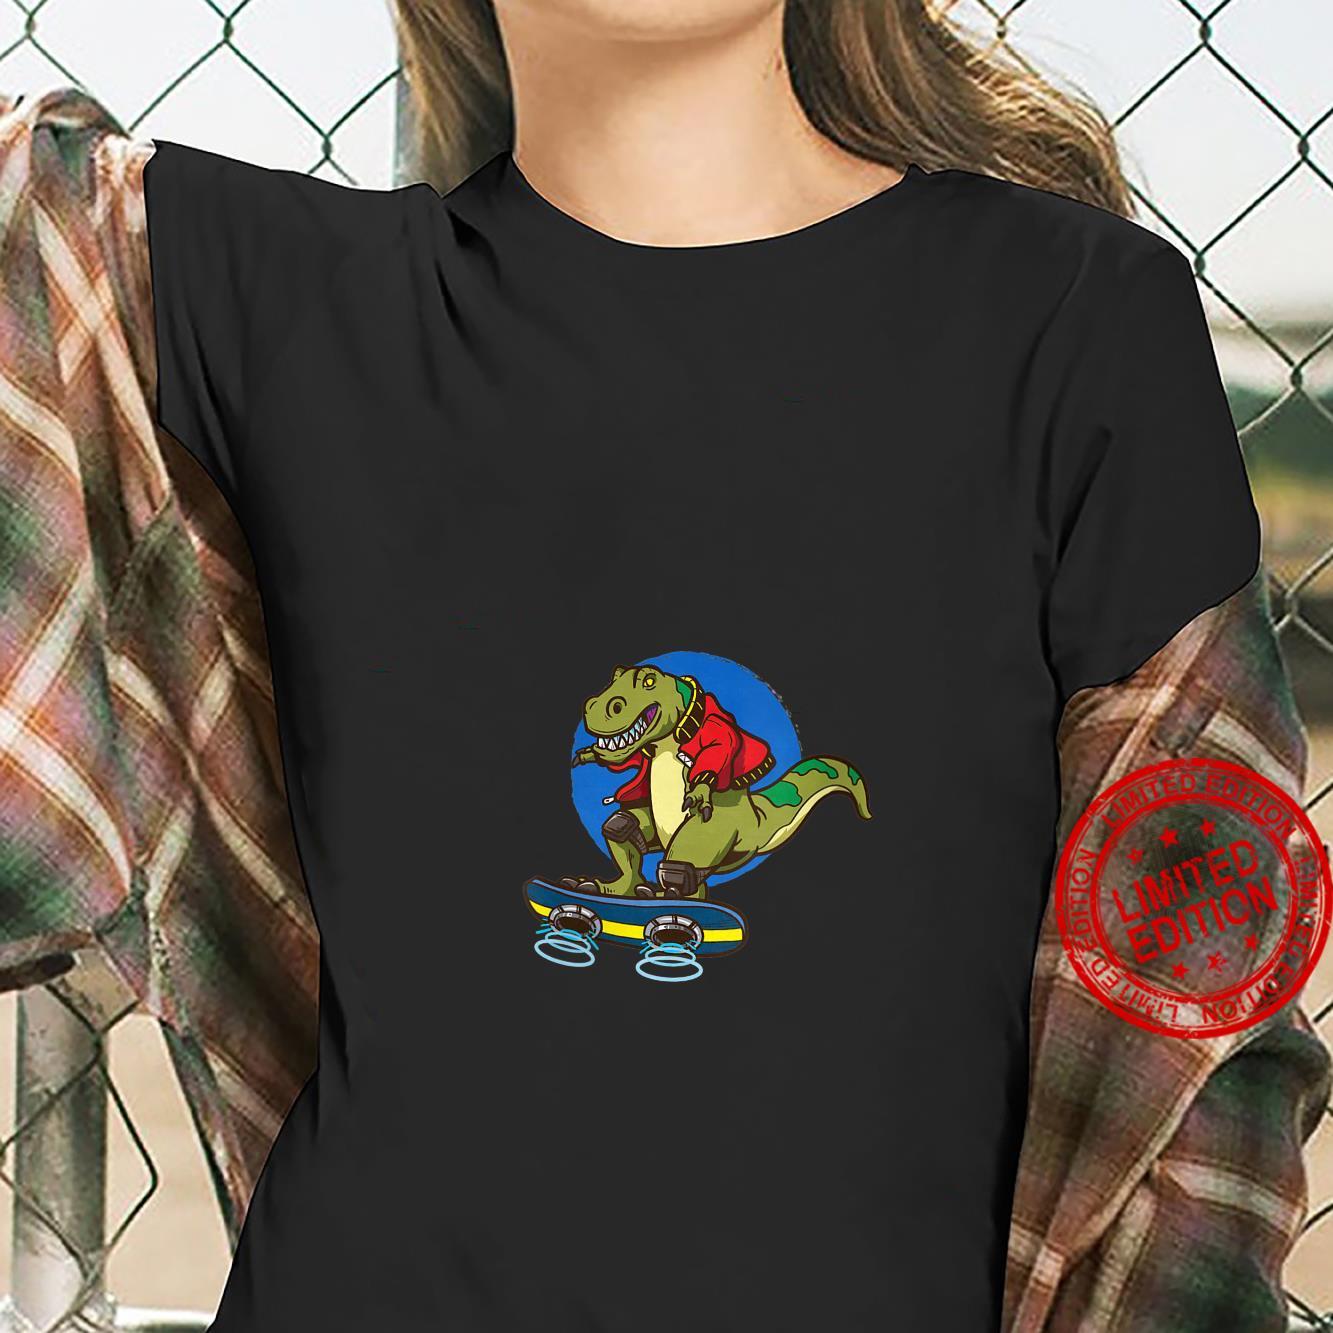 Womens Hoverboard TRex Skating Shirt ladies tee